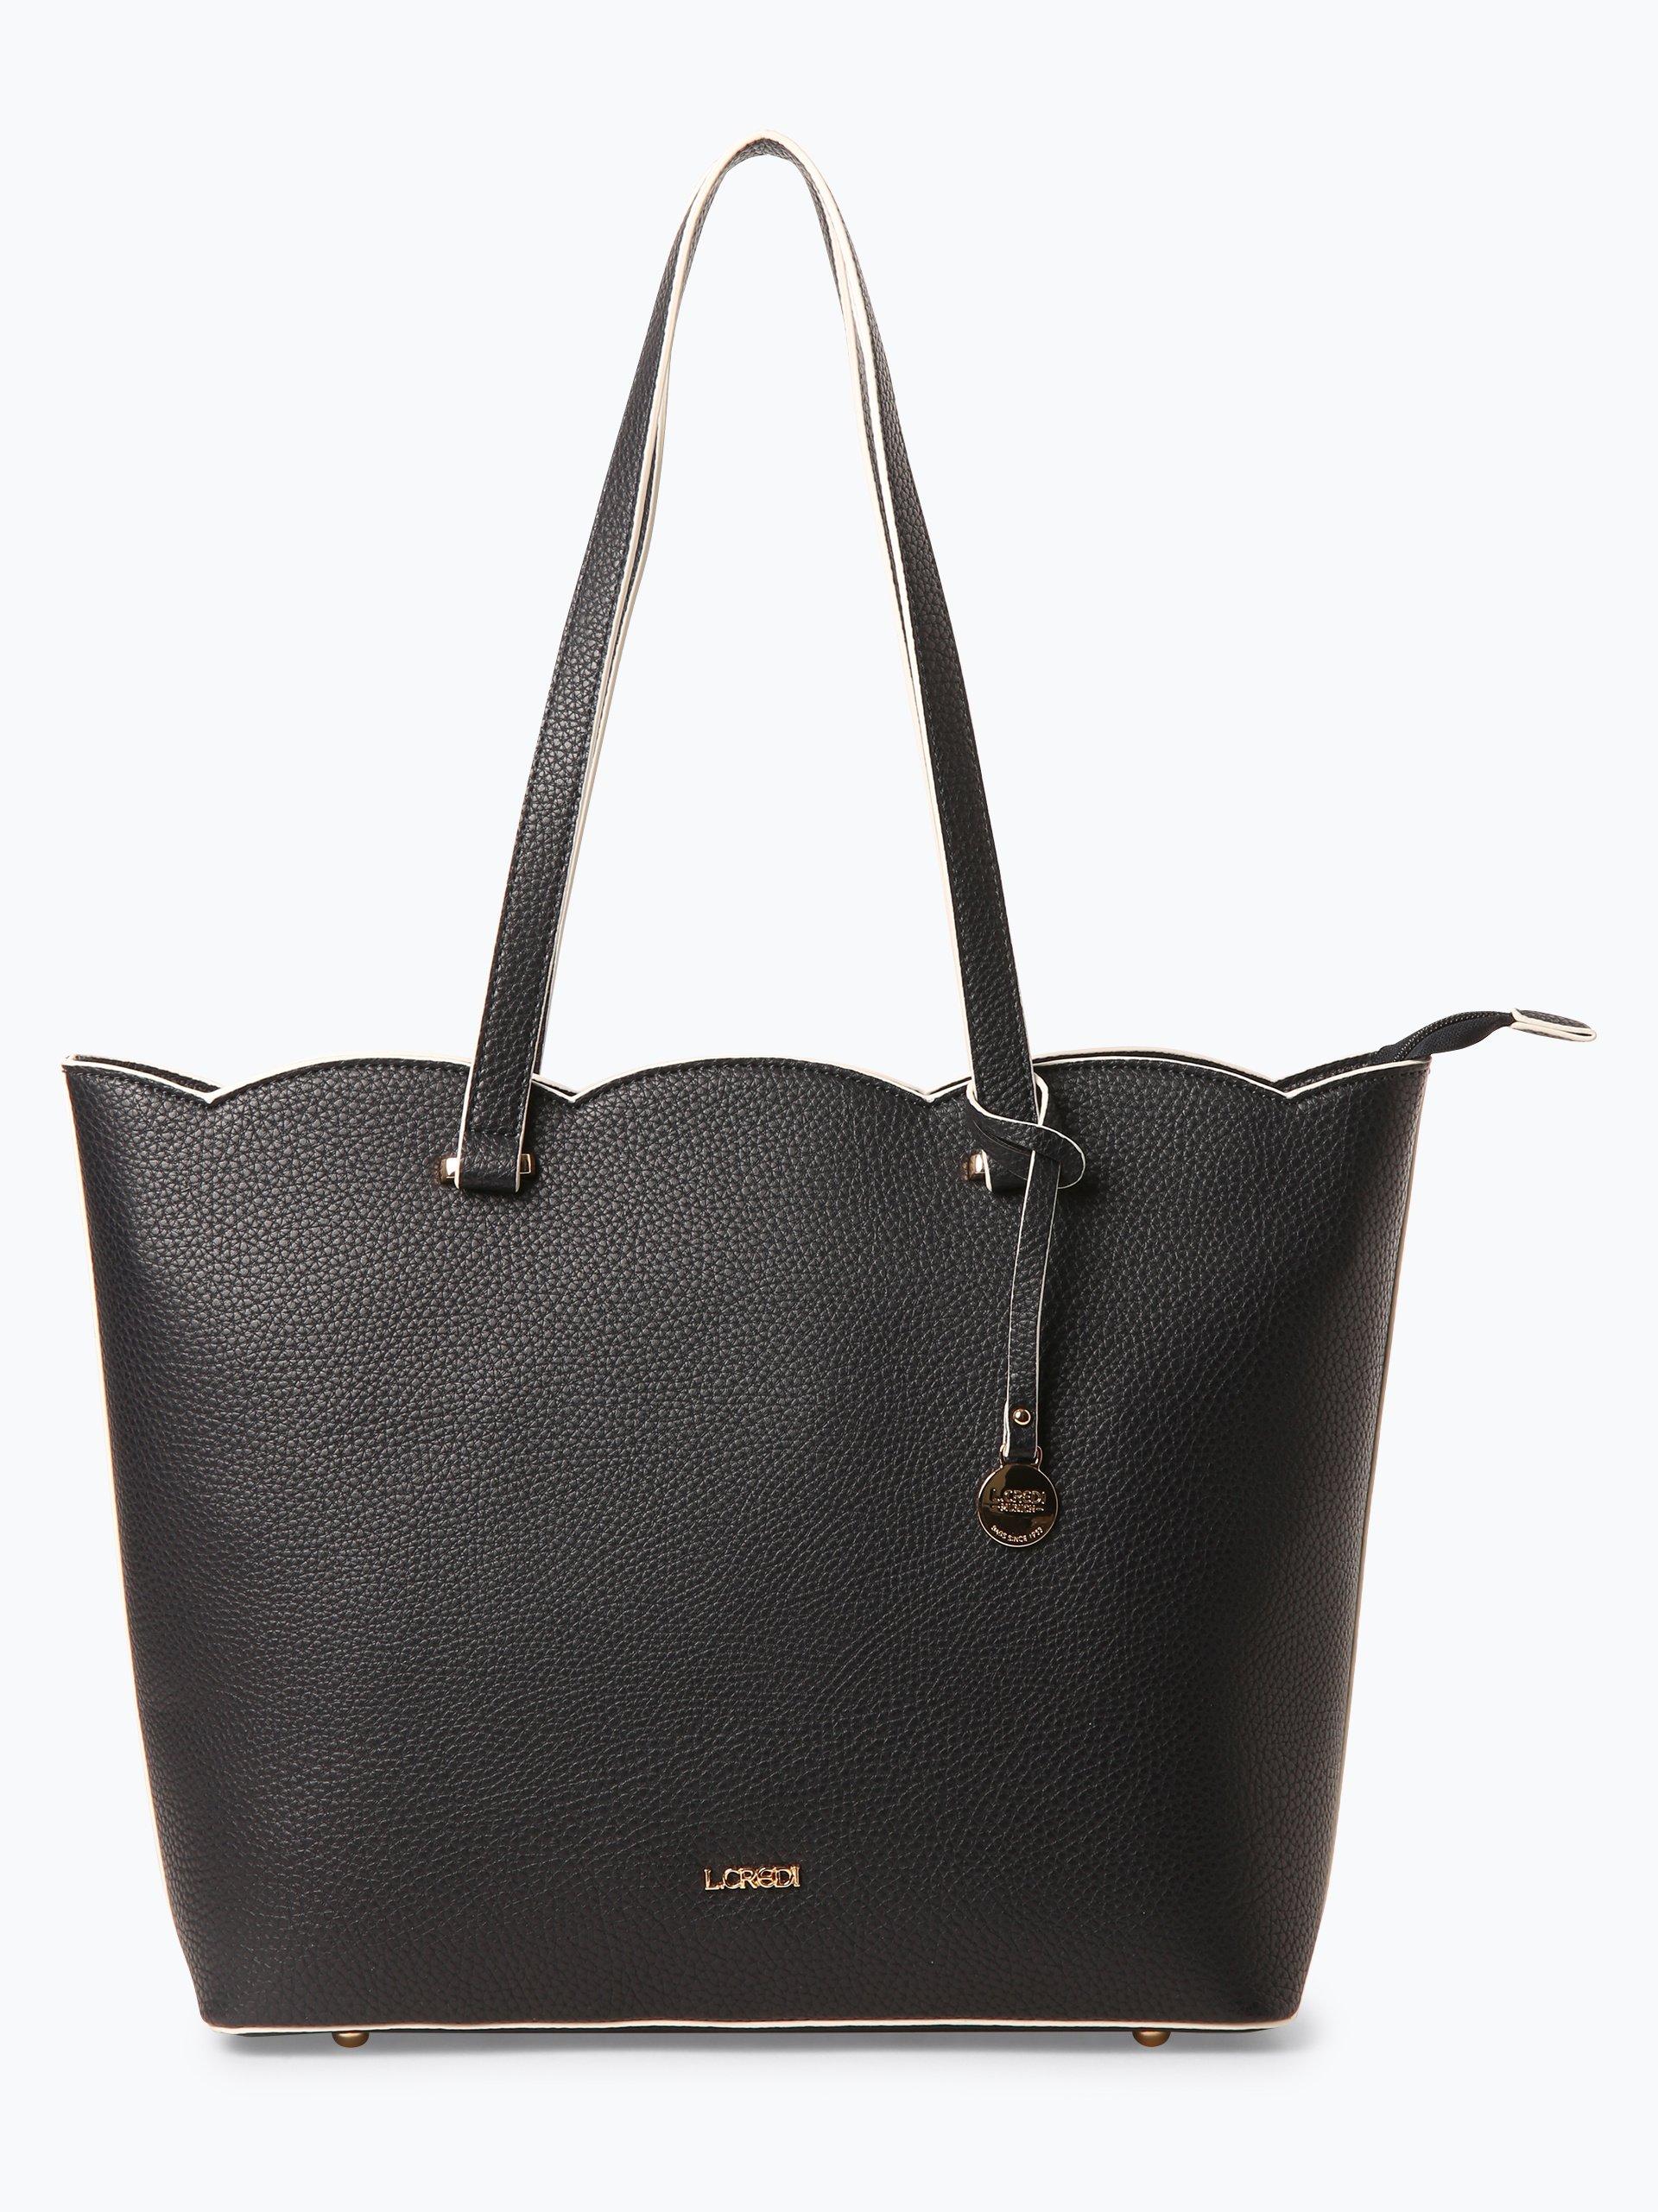 L.Credi Damska torba shopper – Cleo